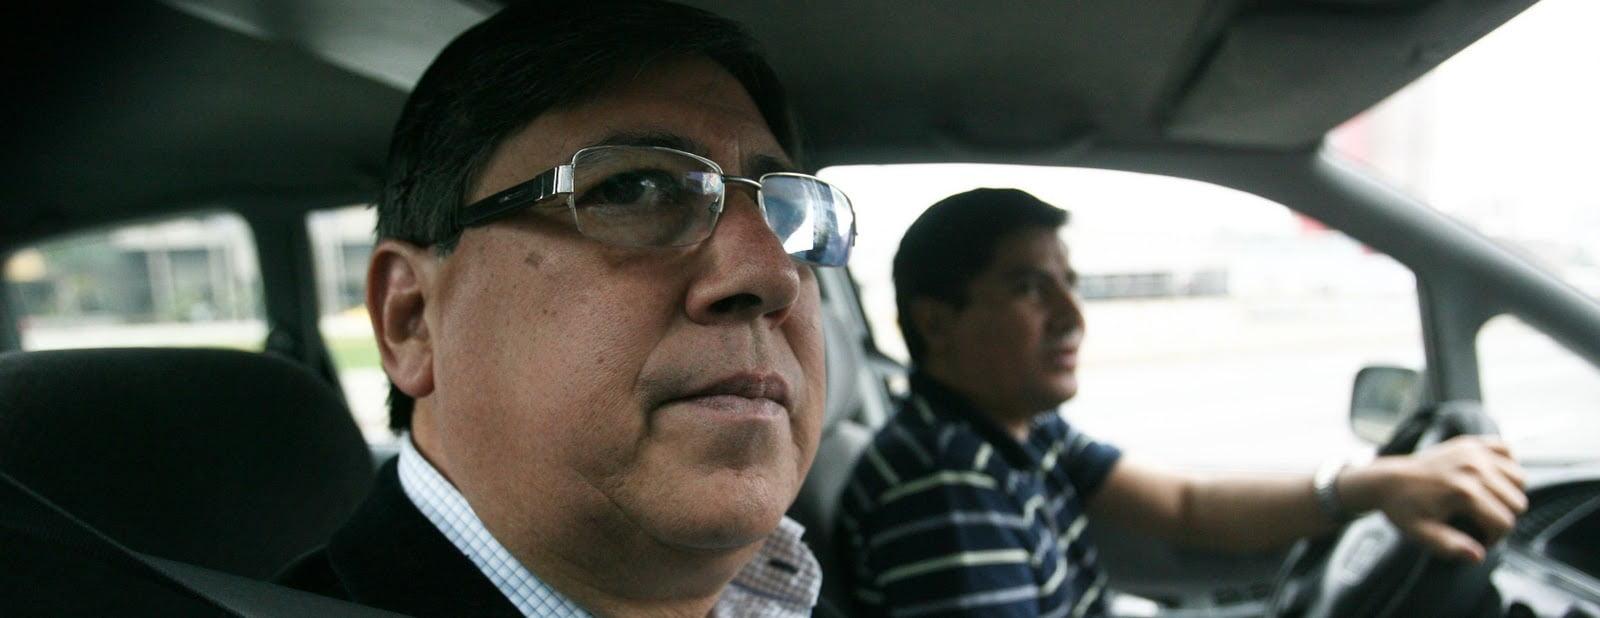 Ex directivo de Alianza Lima Guillermo Alarcón con orden de captura